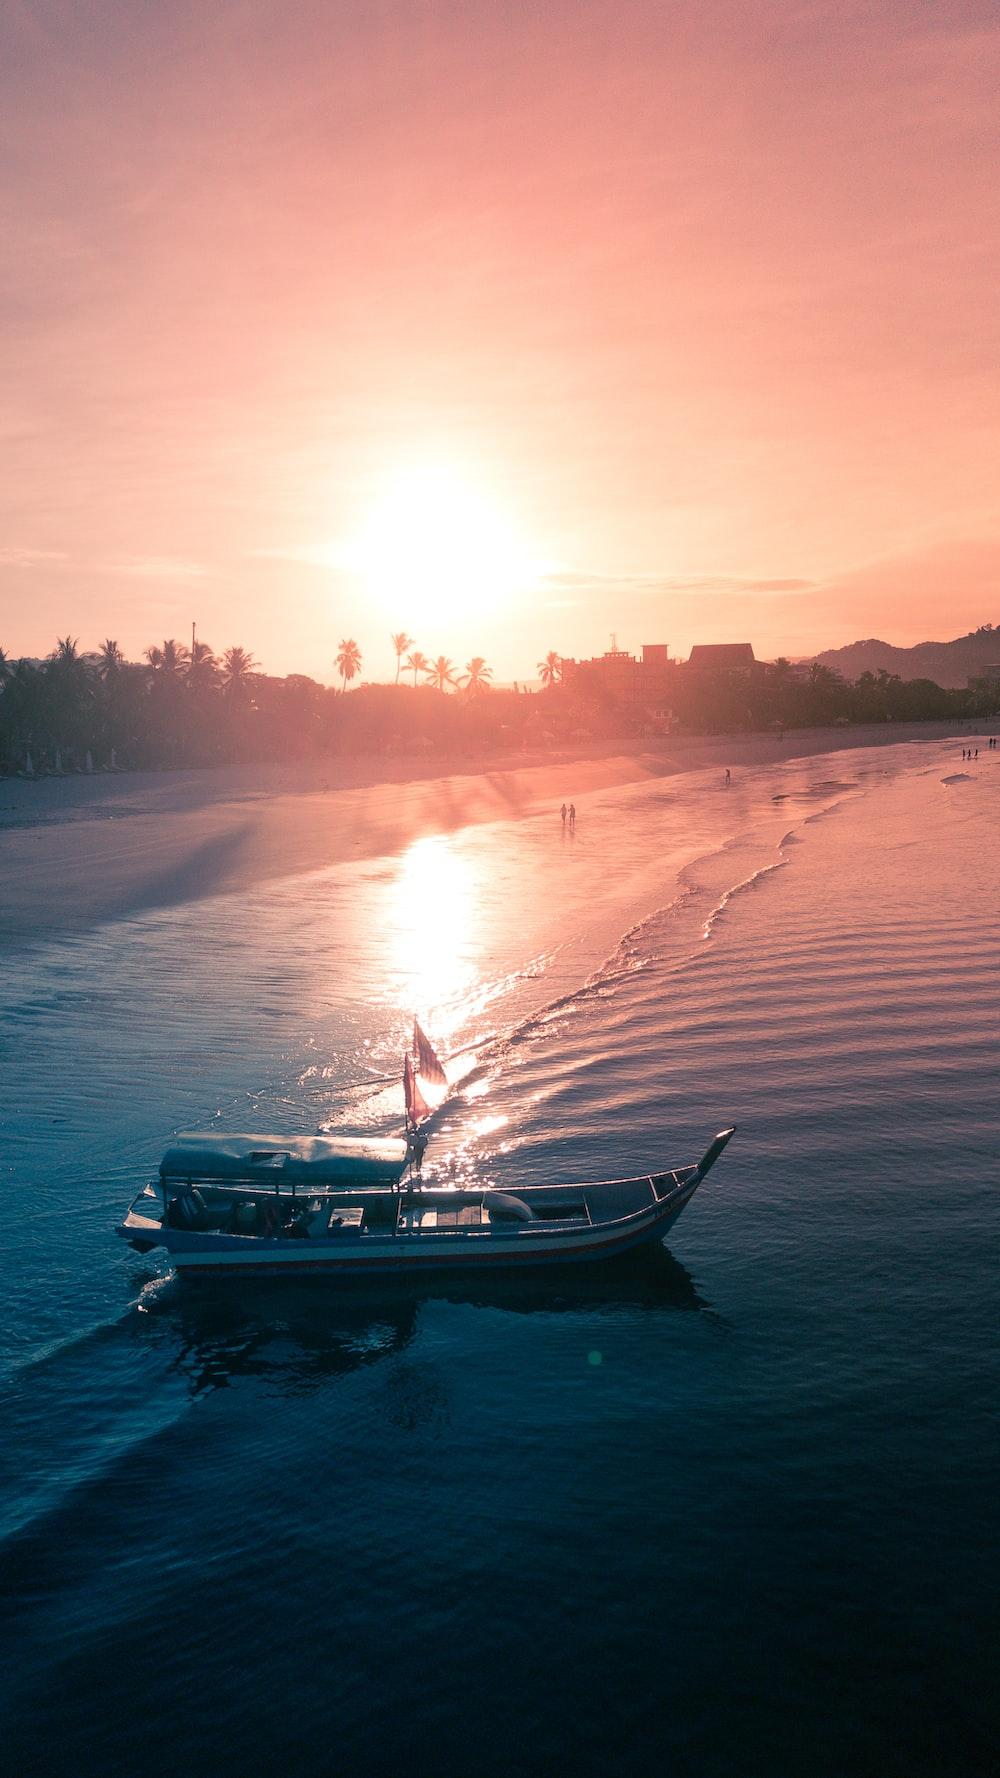 white boat on seashore during sunset time